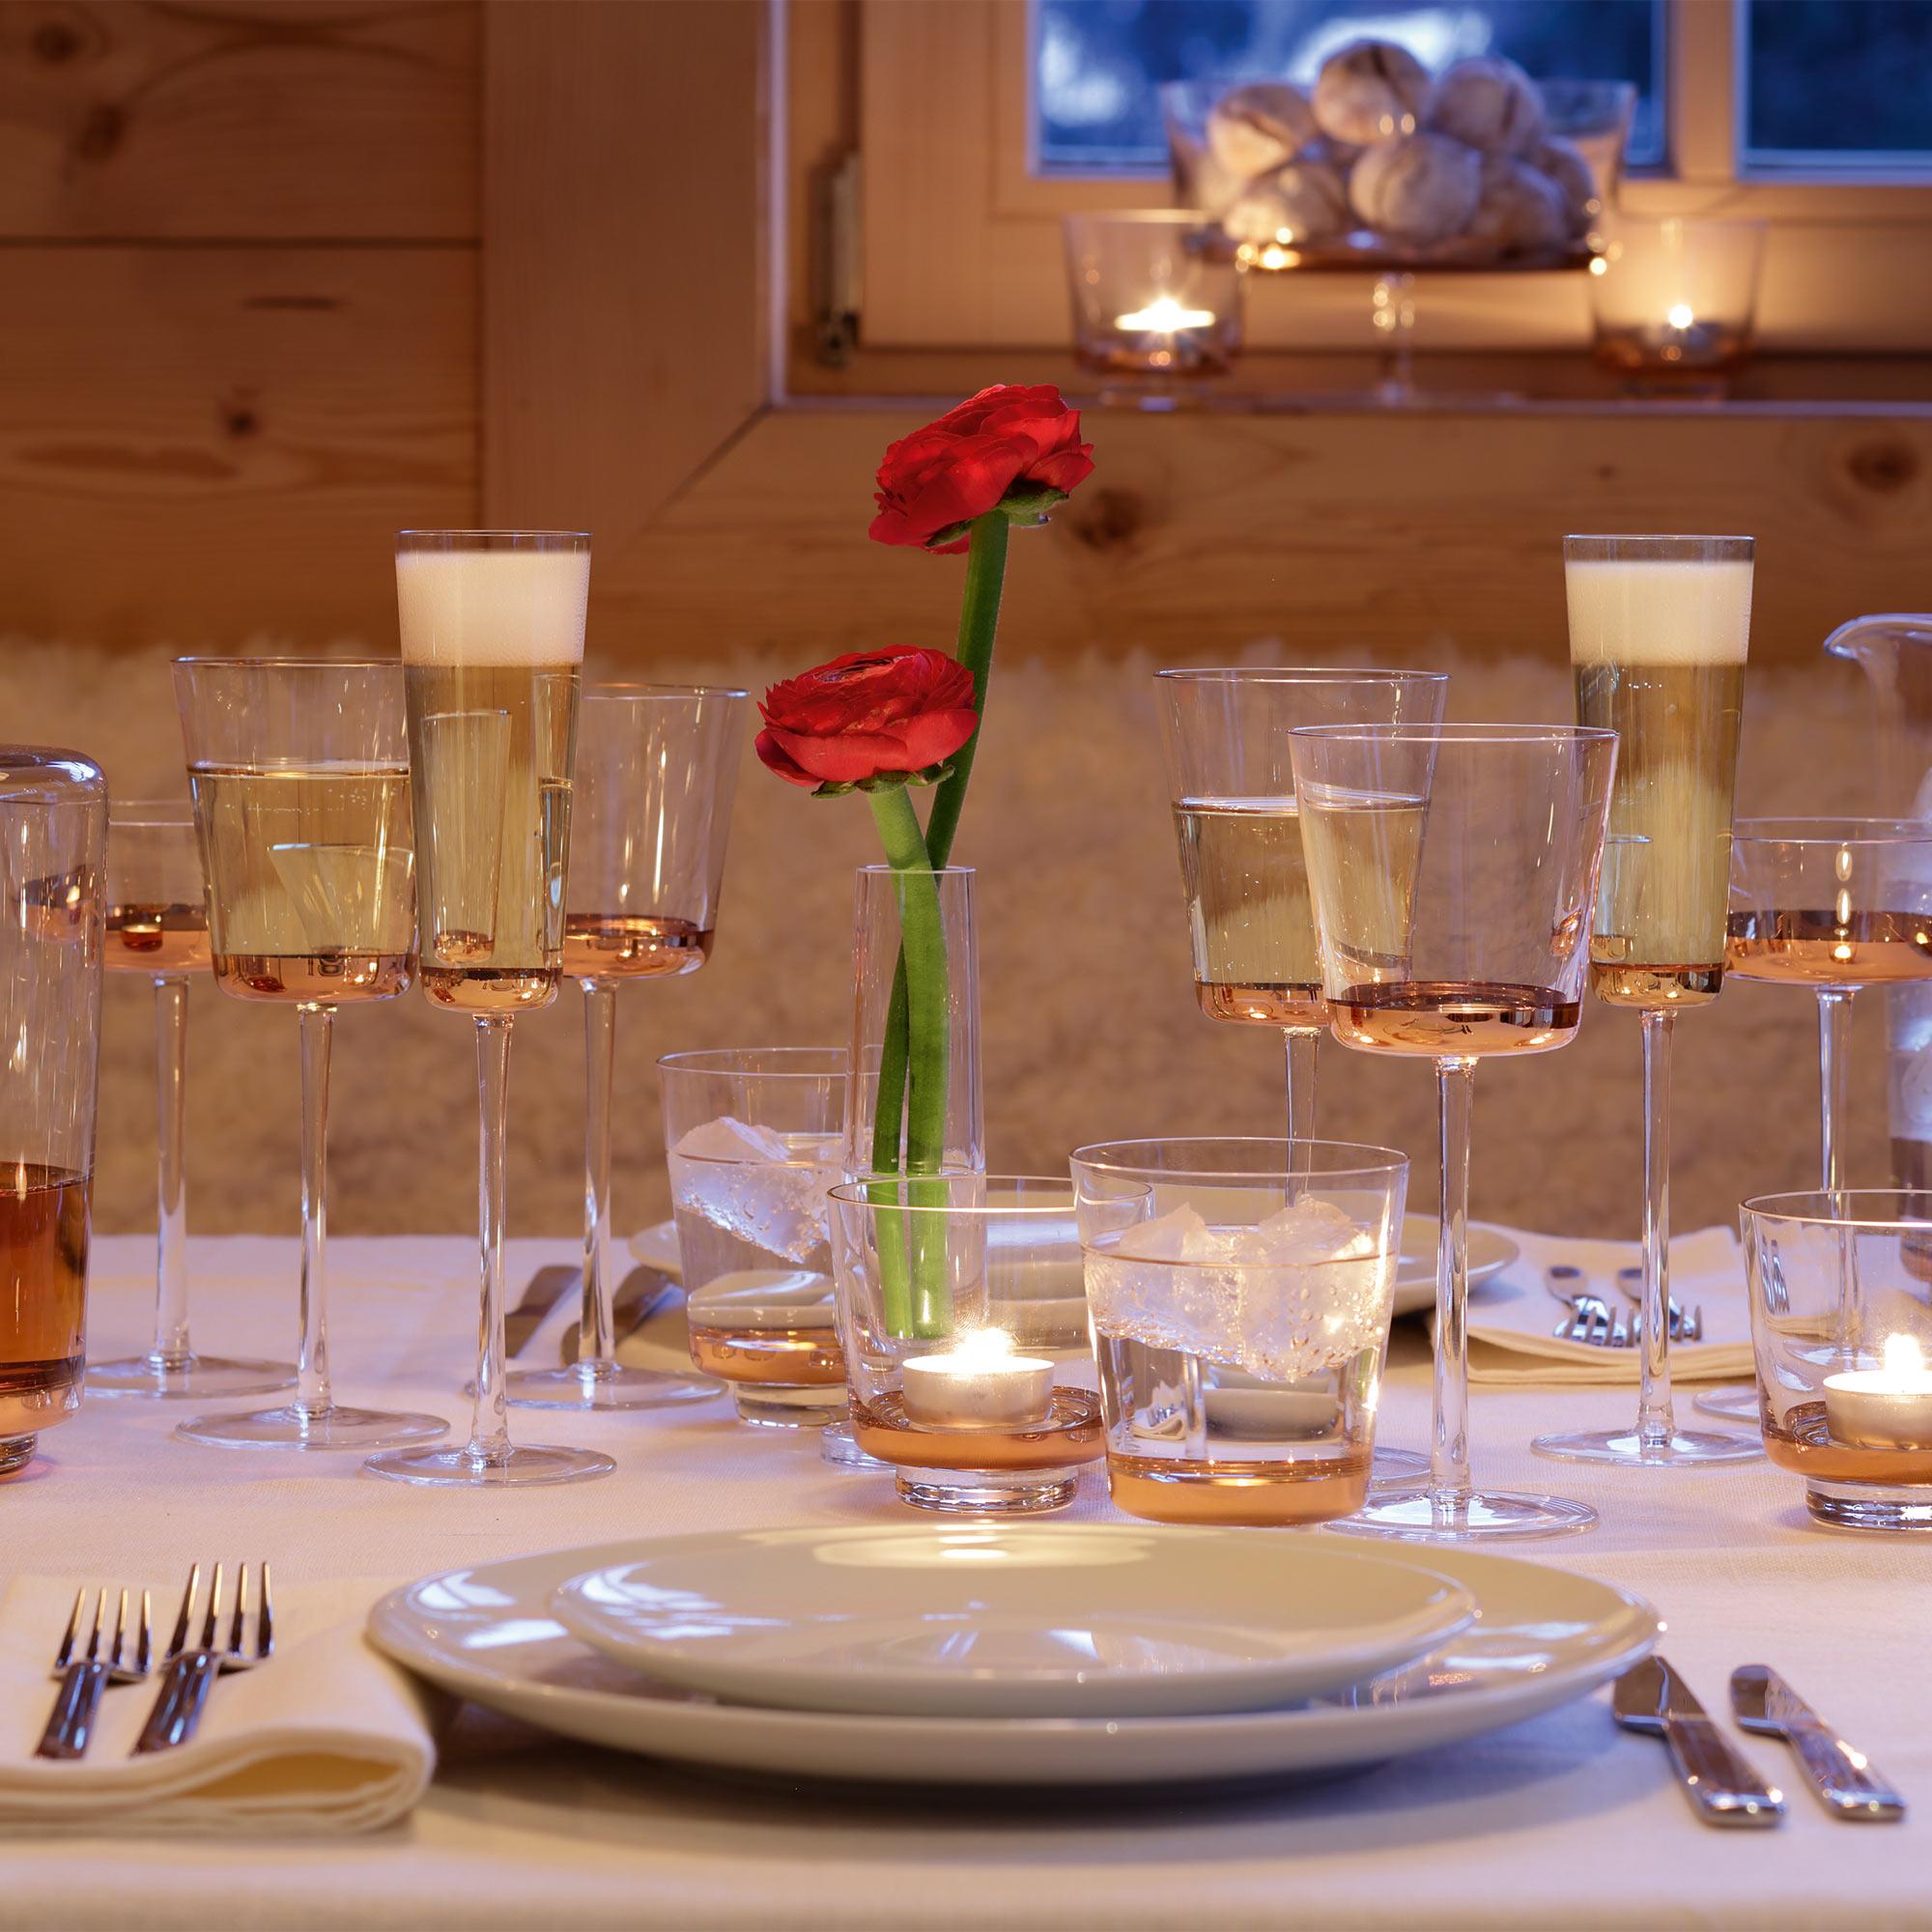 LSA Edge Champagne Flutes Rose Gold 160ml at drinkstuff